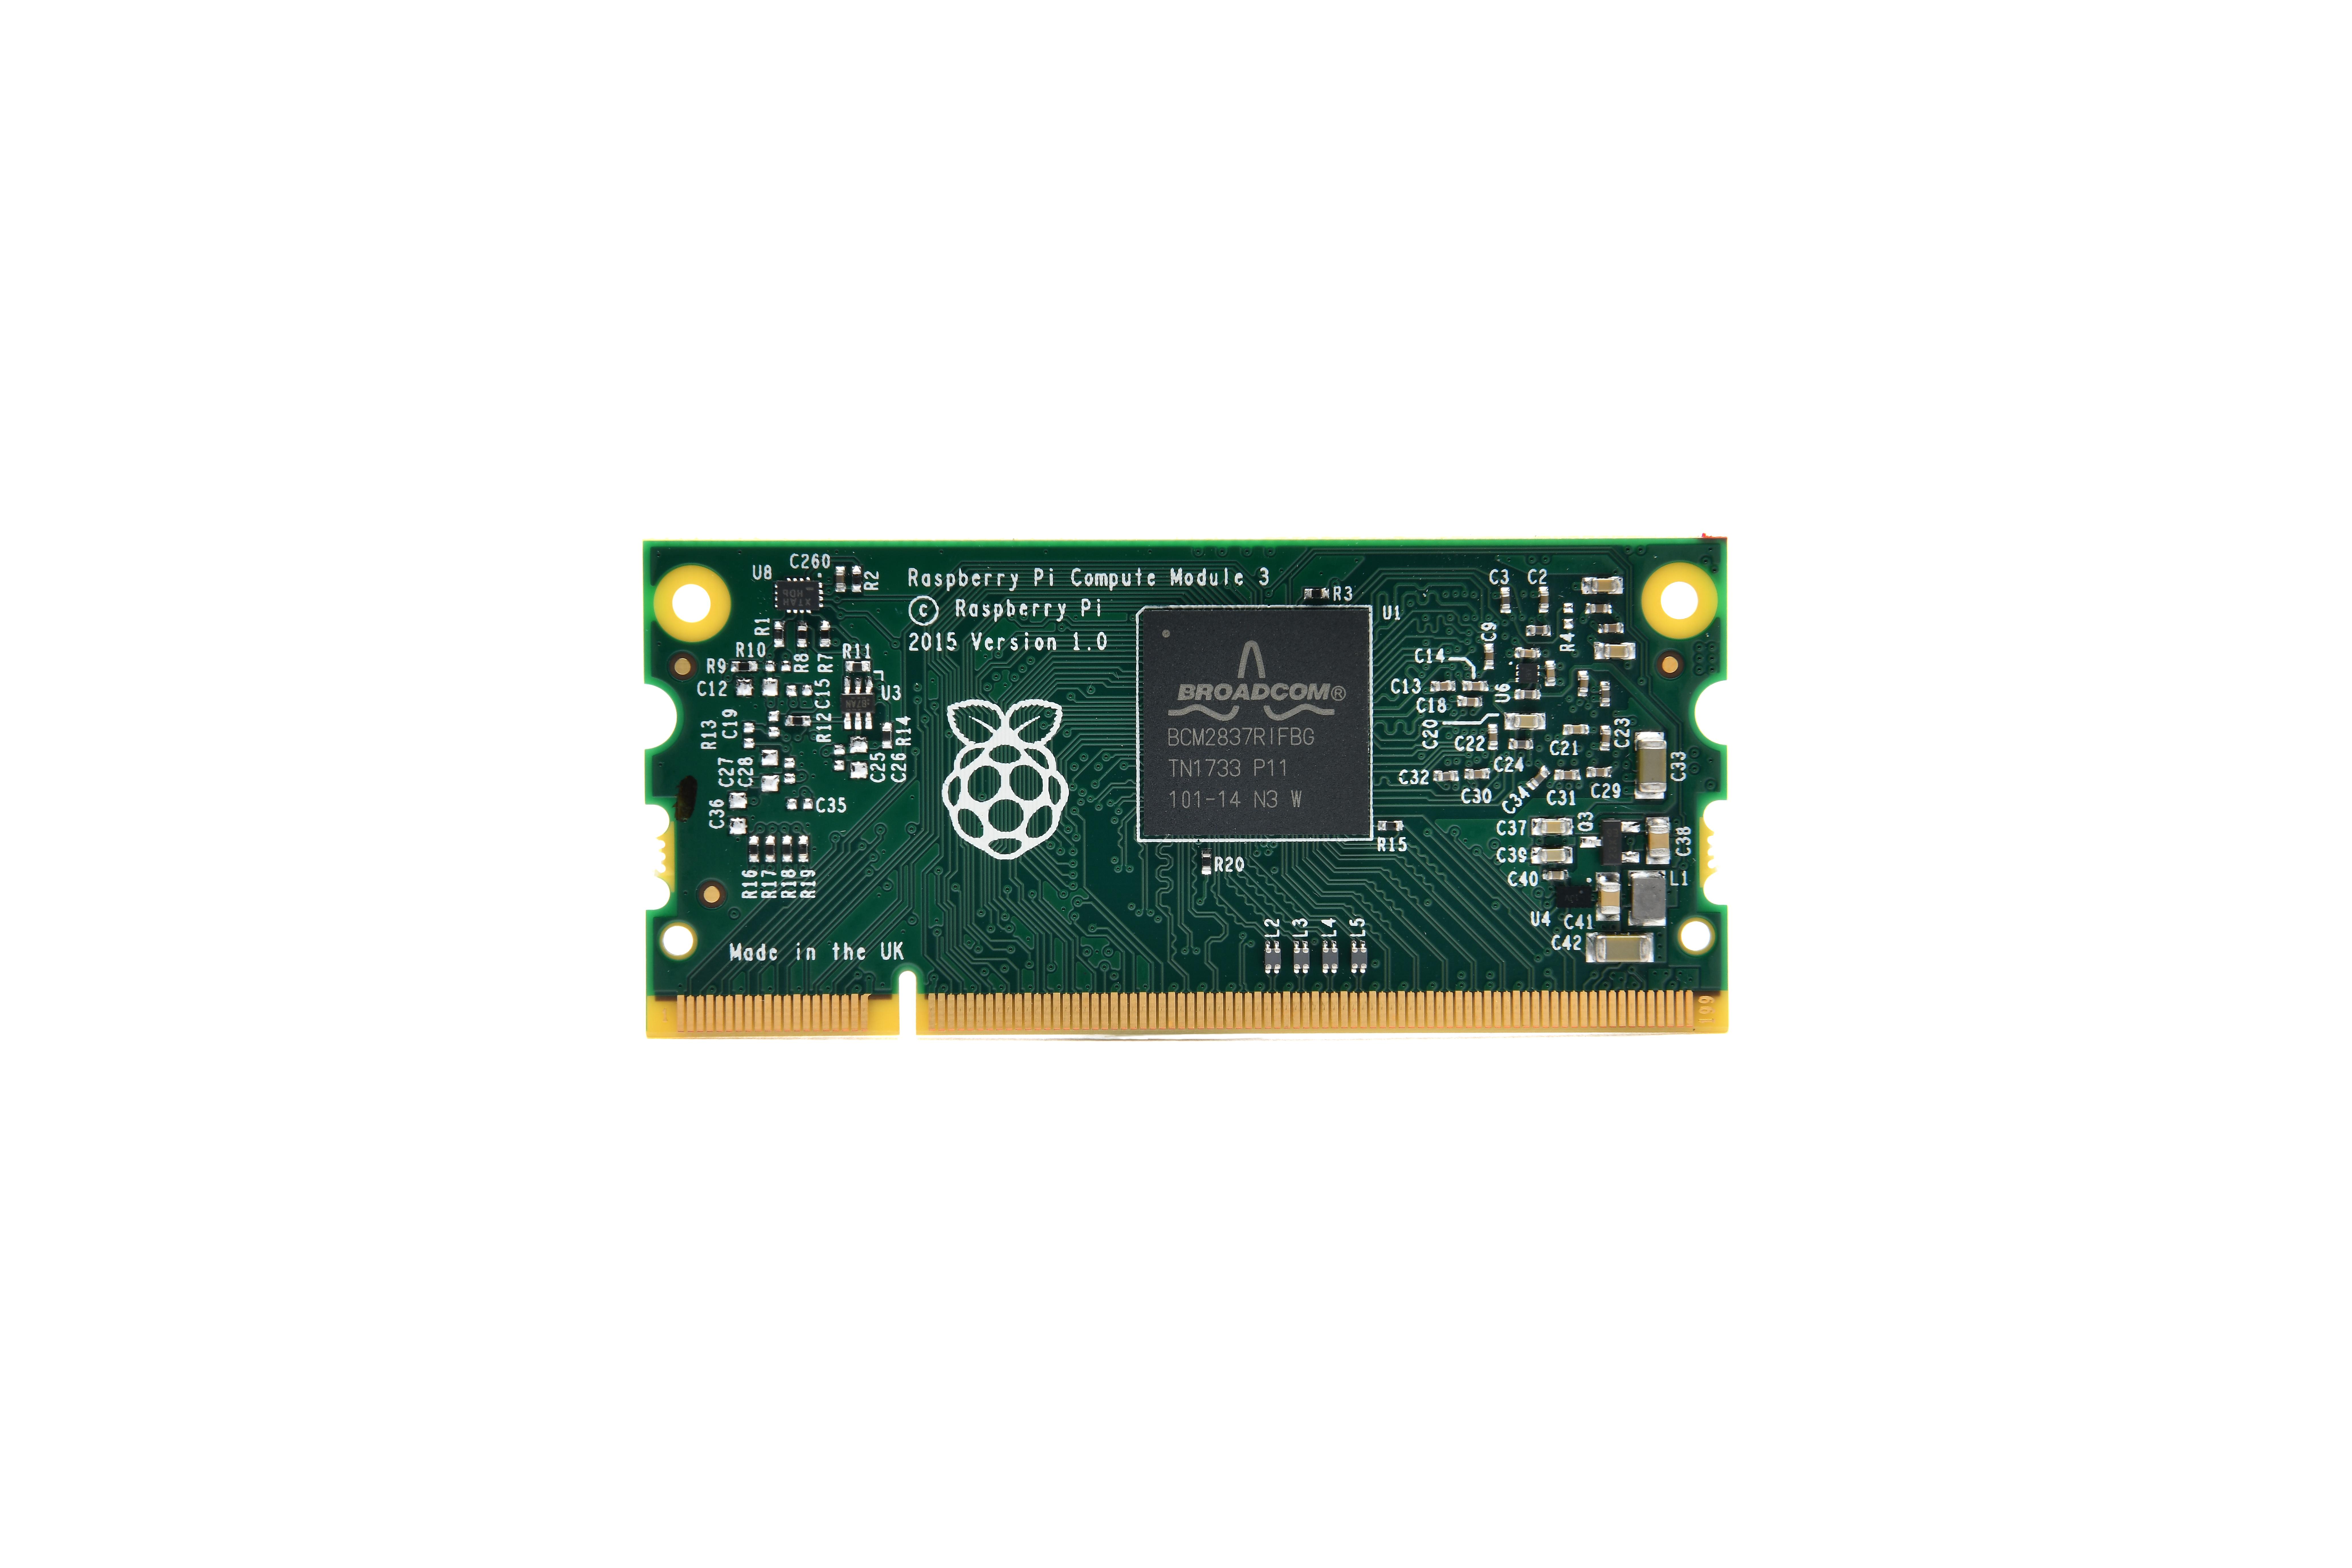 Raspberry Pi(ラズベリーパイ)Compute Module 3 Lite